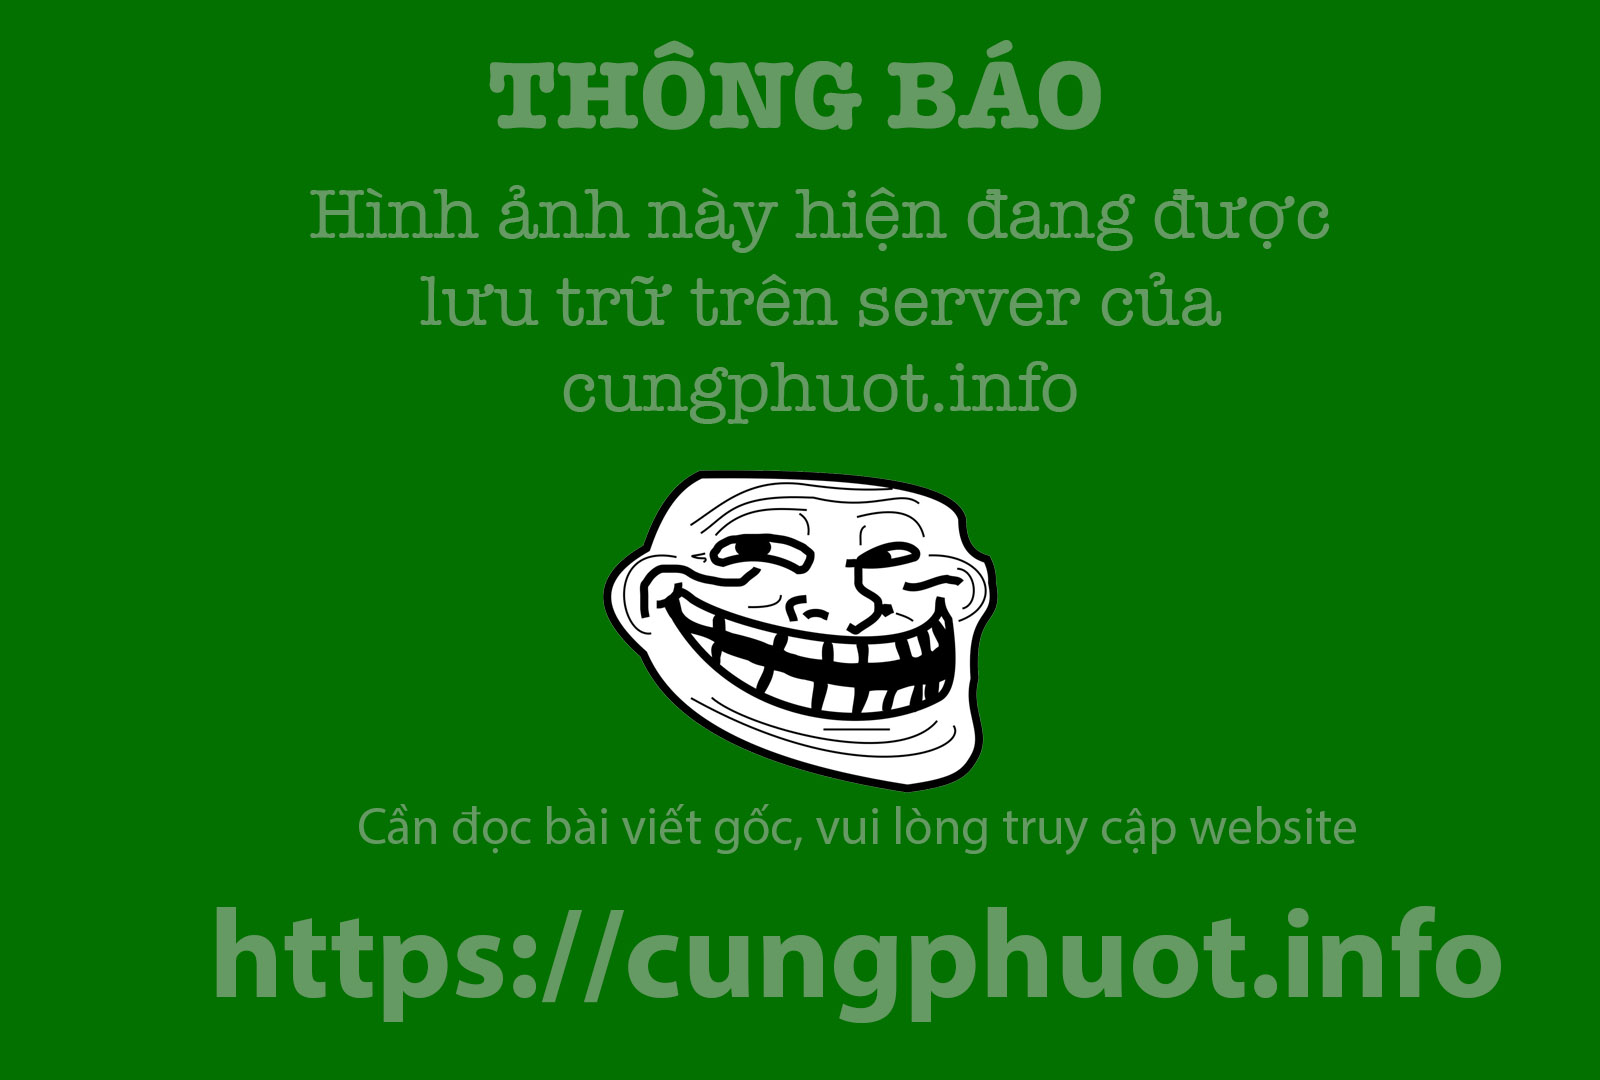 Den Moc Chau san mai anh dao hinh anh 9